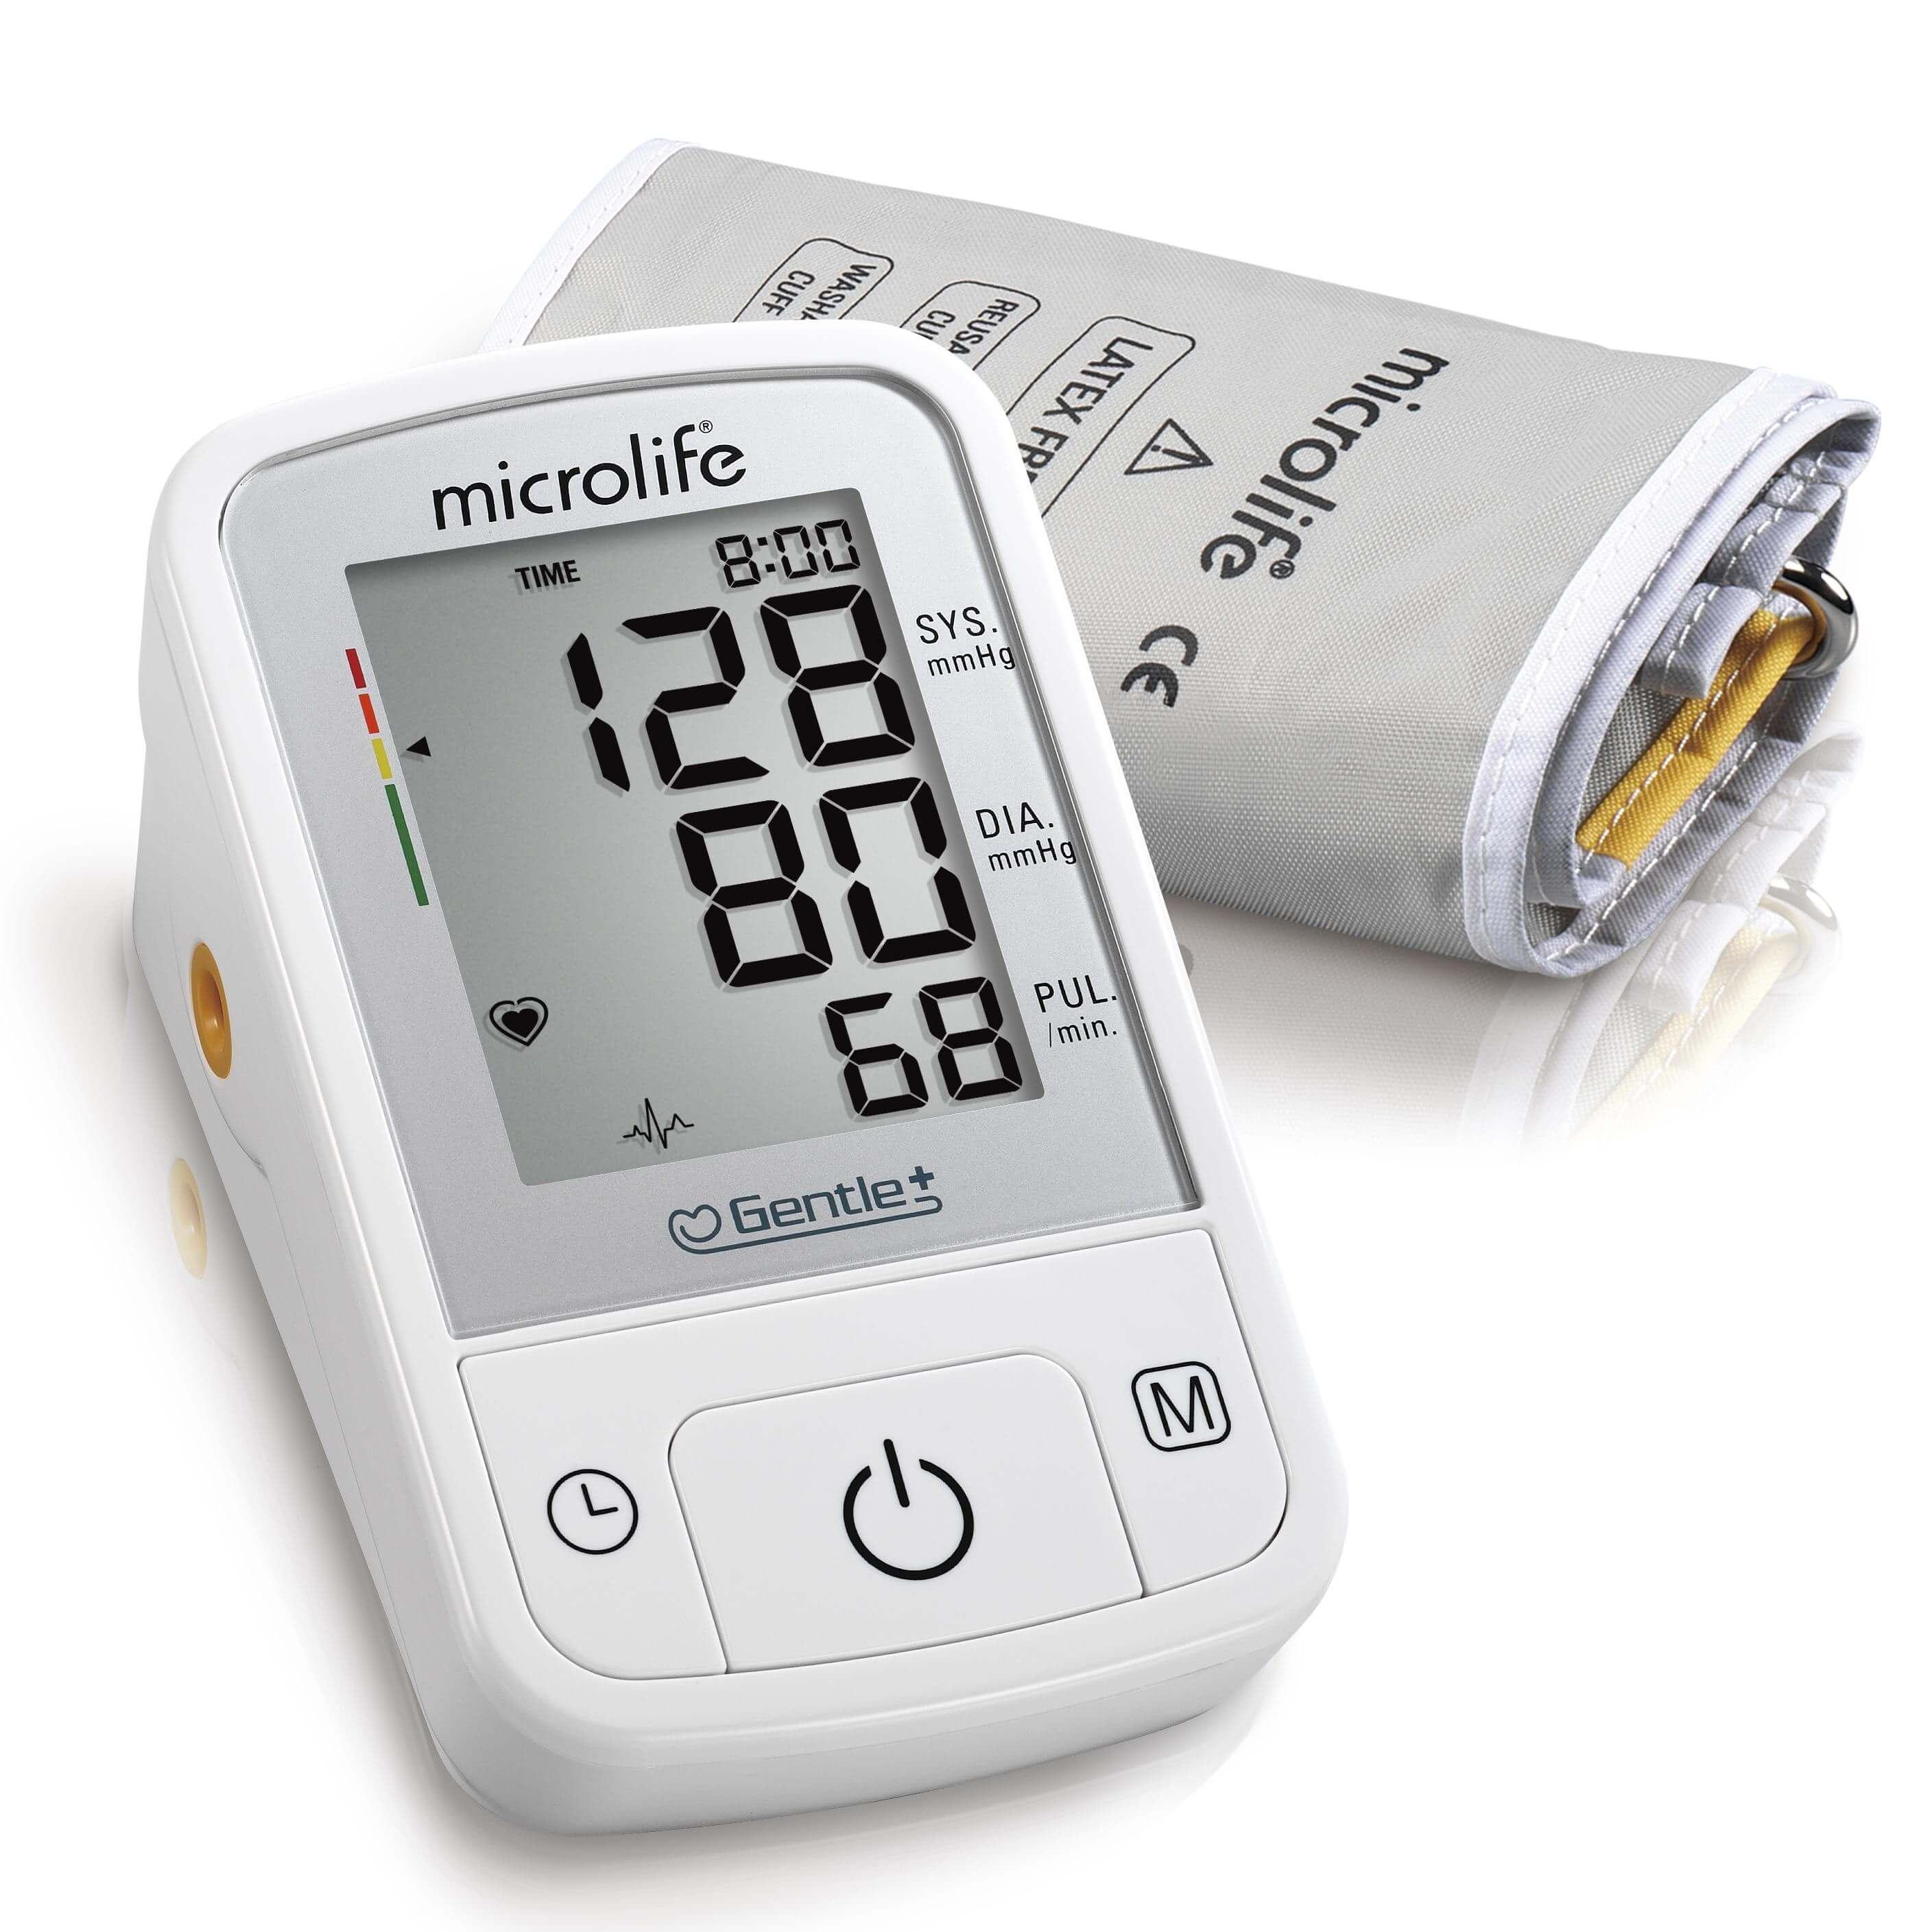 Microlife BP A2 Basic Ψηφιακό Πιεσόμετρο Μπράτσου με Τεχνολογία PAD για Ανίχνευσ φαρμακείο   πιεσόμετρα   θερμόμετρα   ηλεκτρικές συσκευές   πιεσόμετρα